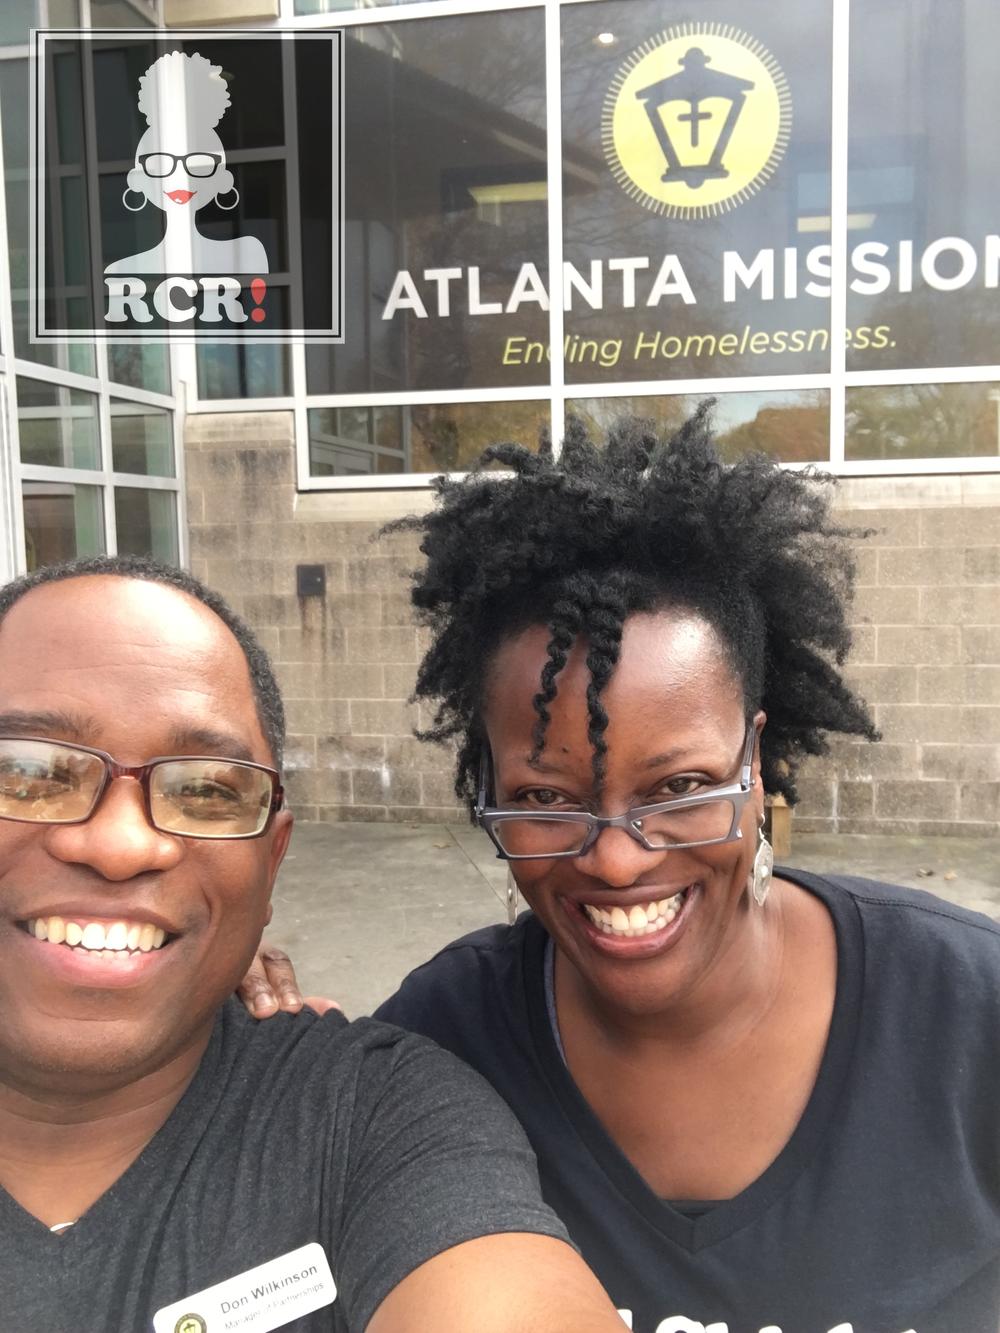 Real Chicks Rock! & The Atlanta Mission